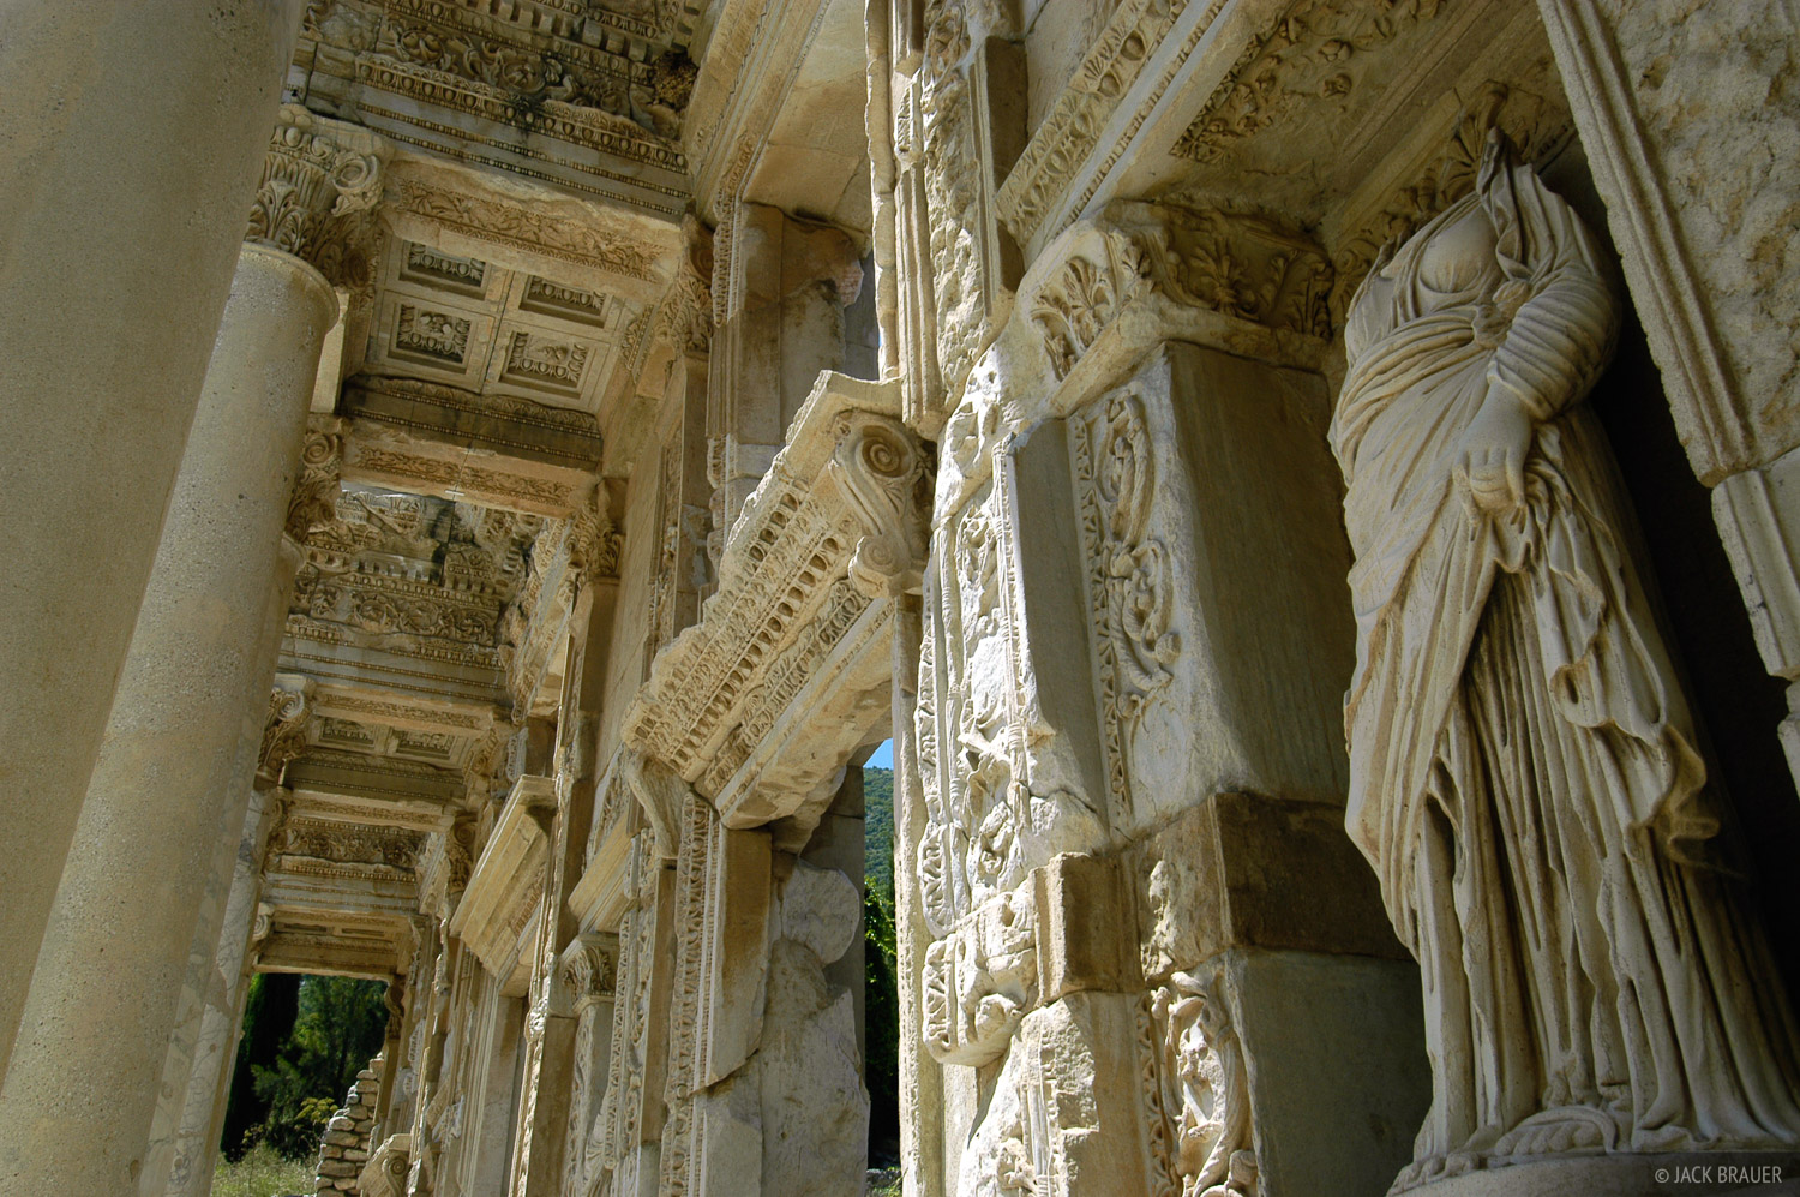 Library of Celsus, Ephesus, Turkey, photo